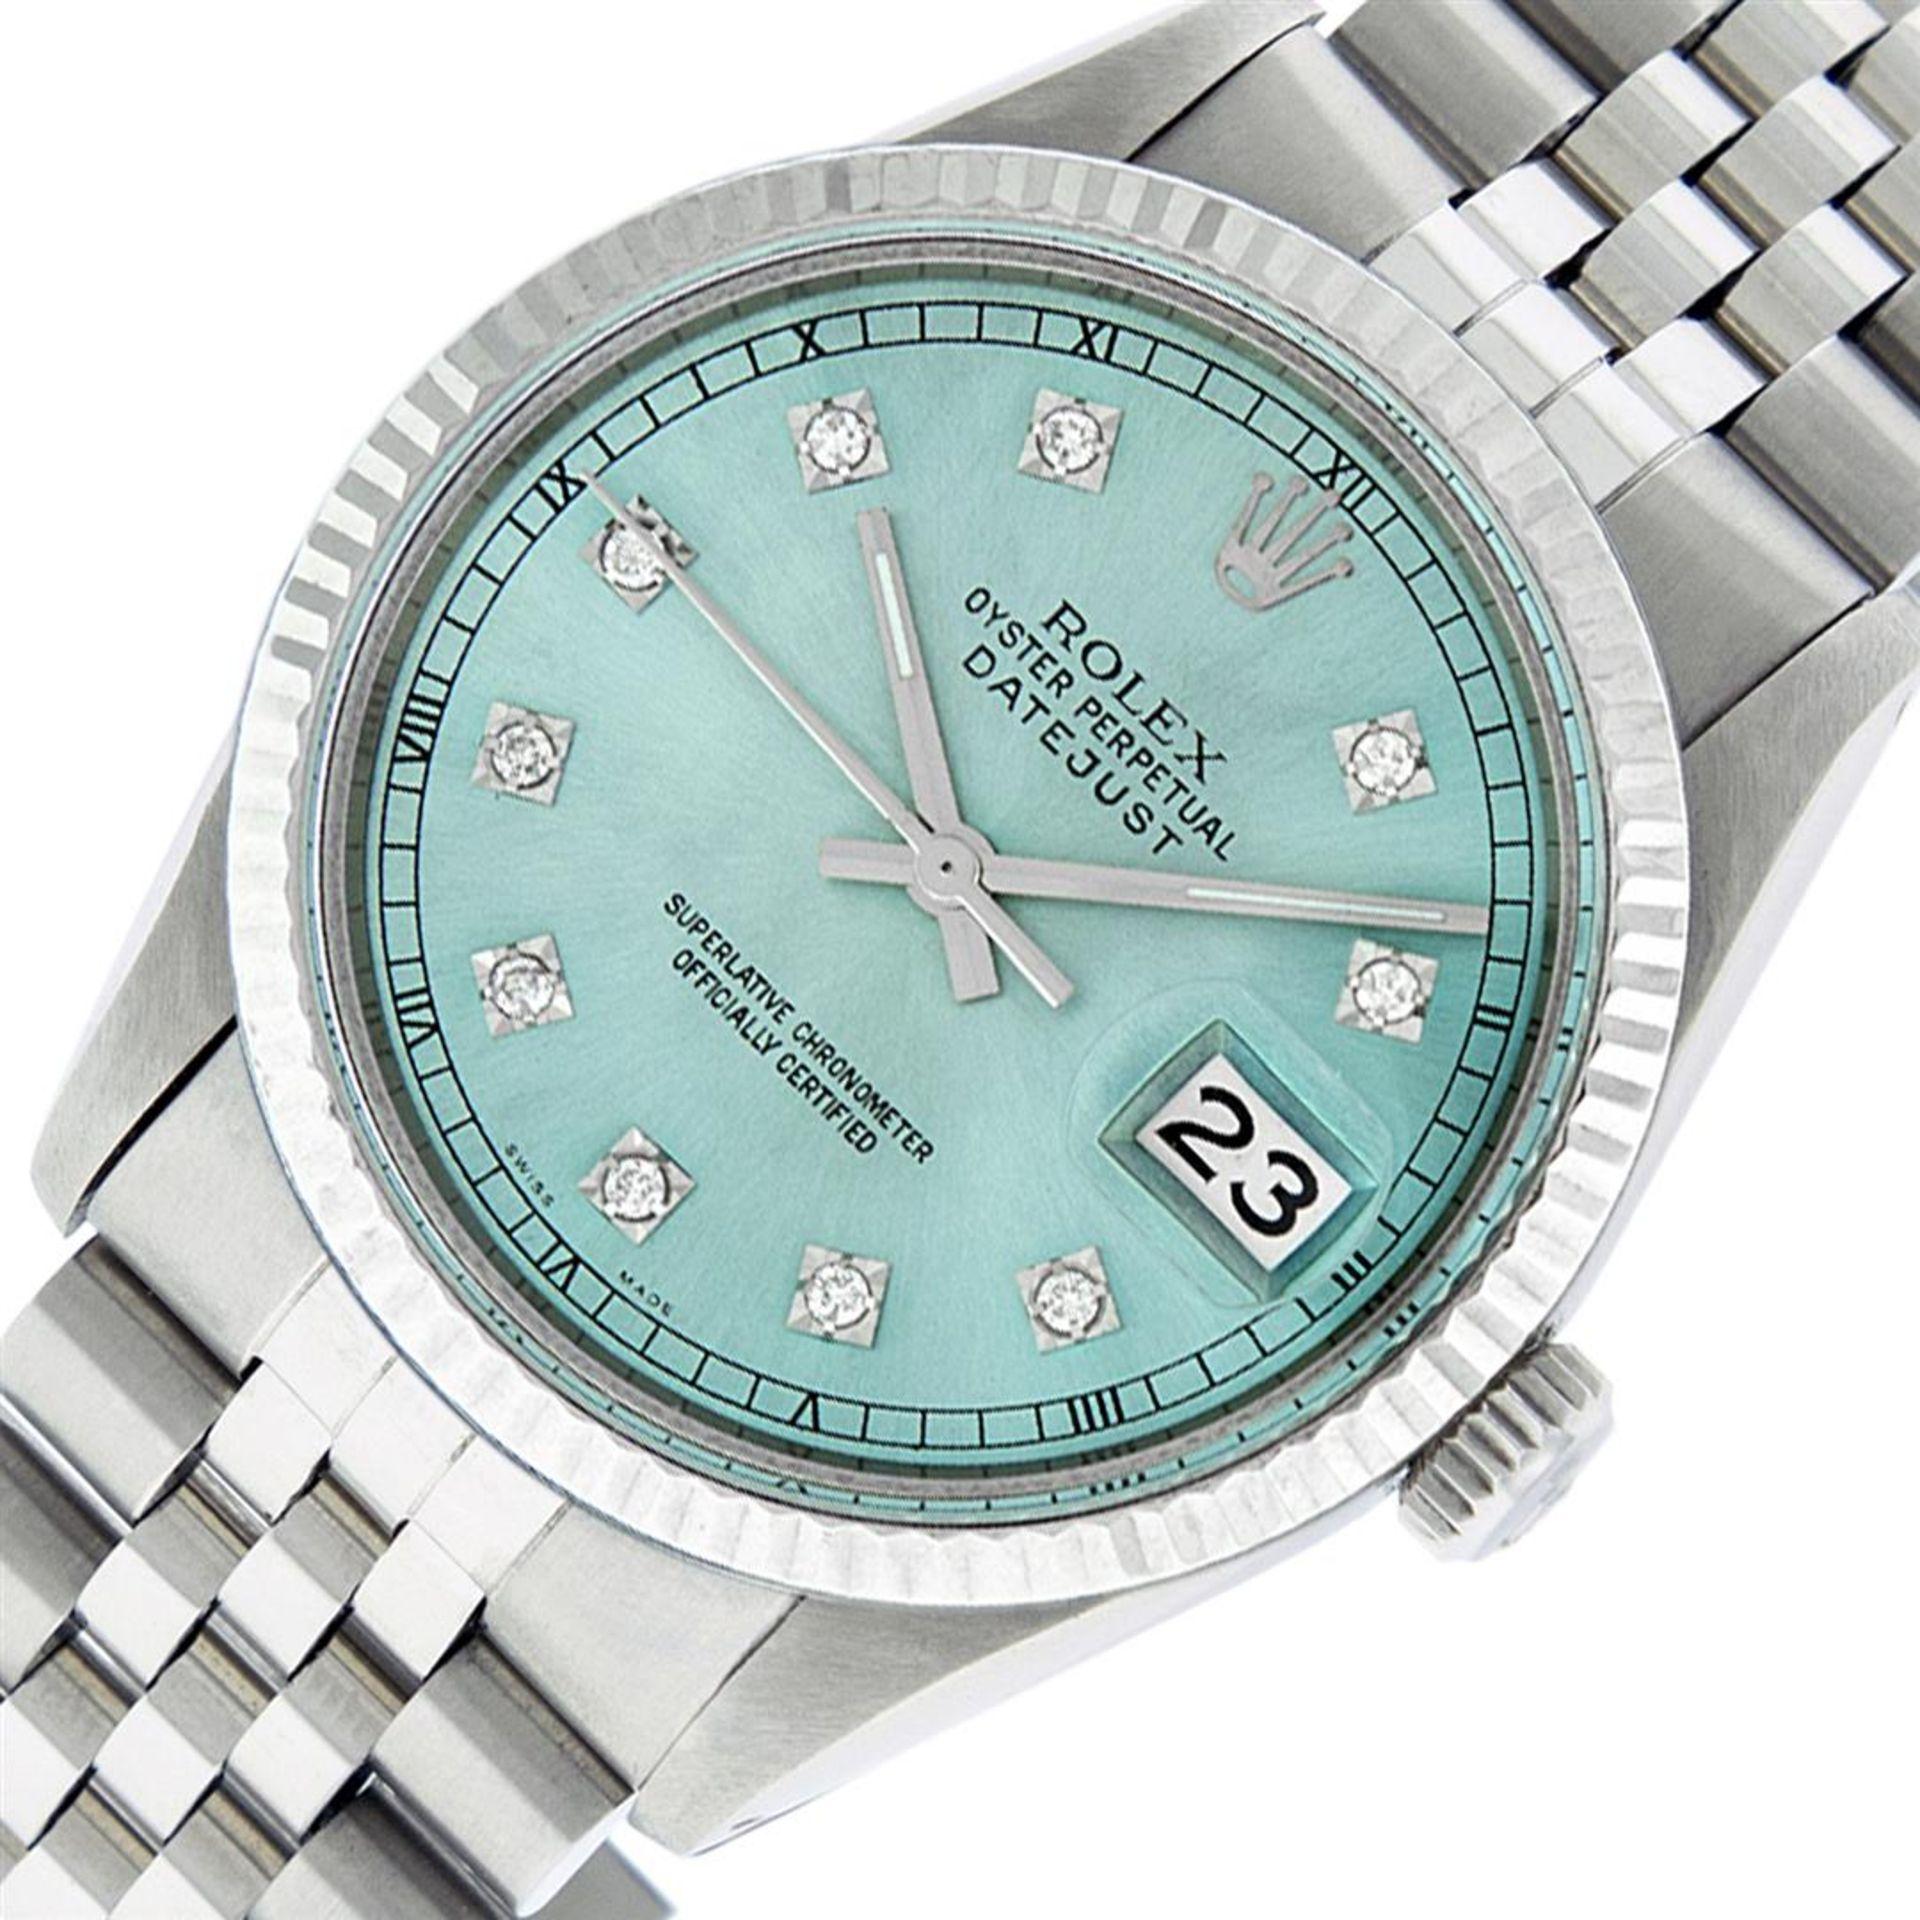 Rolex Mens Stainless Steel Ice Blue Diamond Datejust Wristwatch - Image 3 of 9